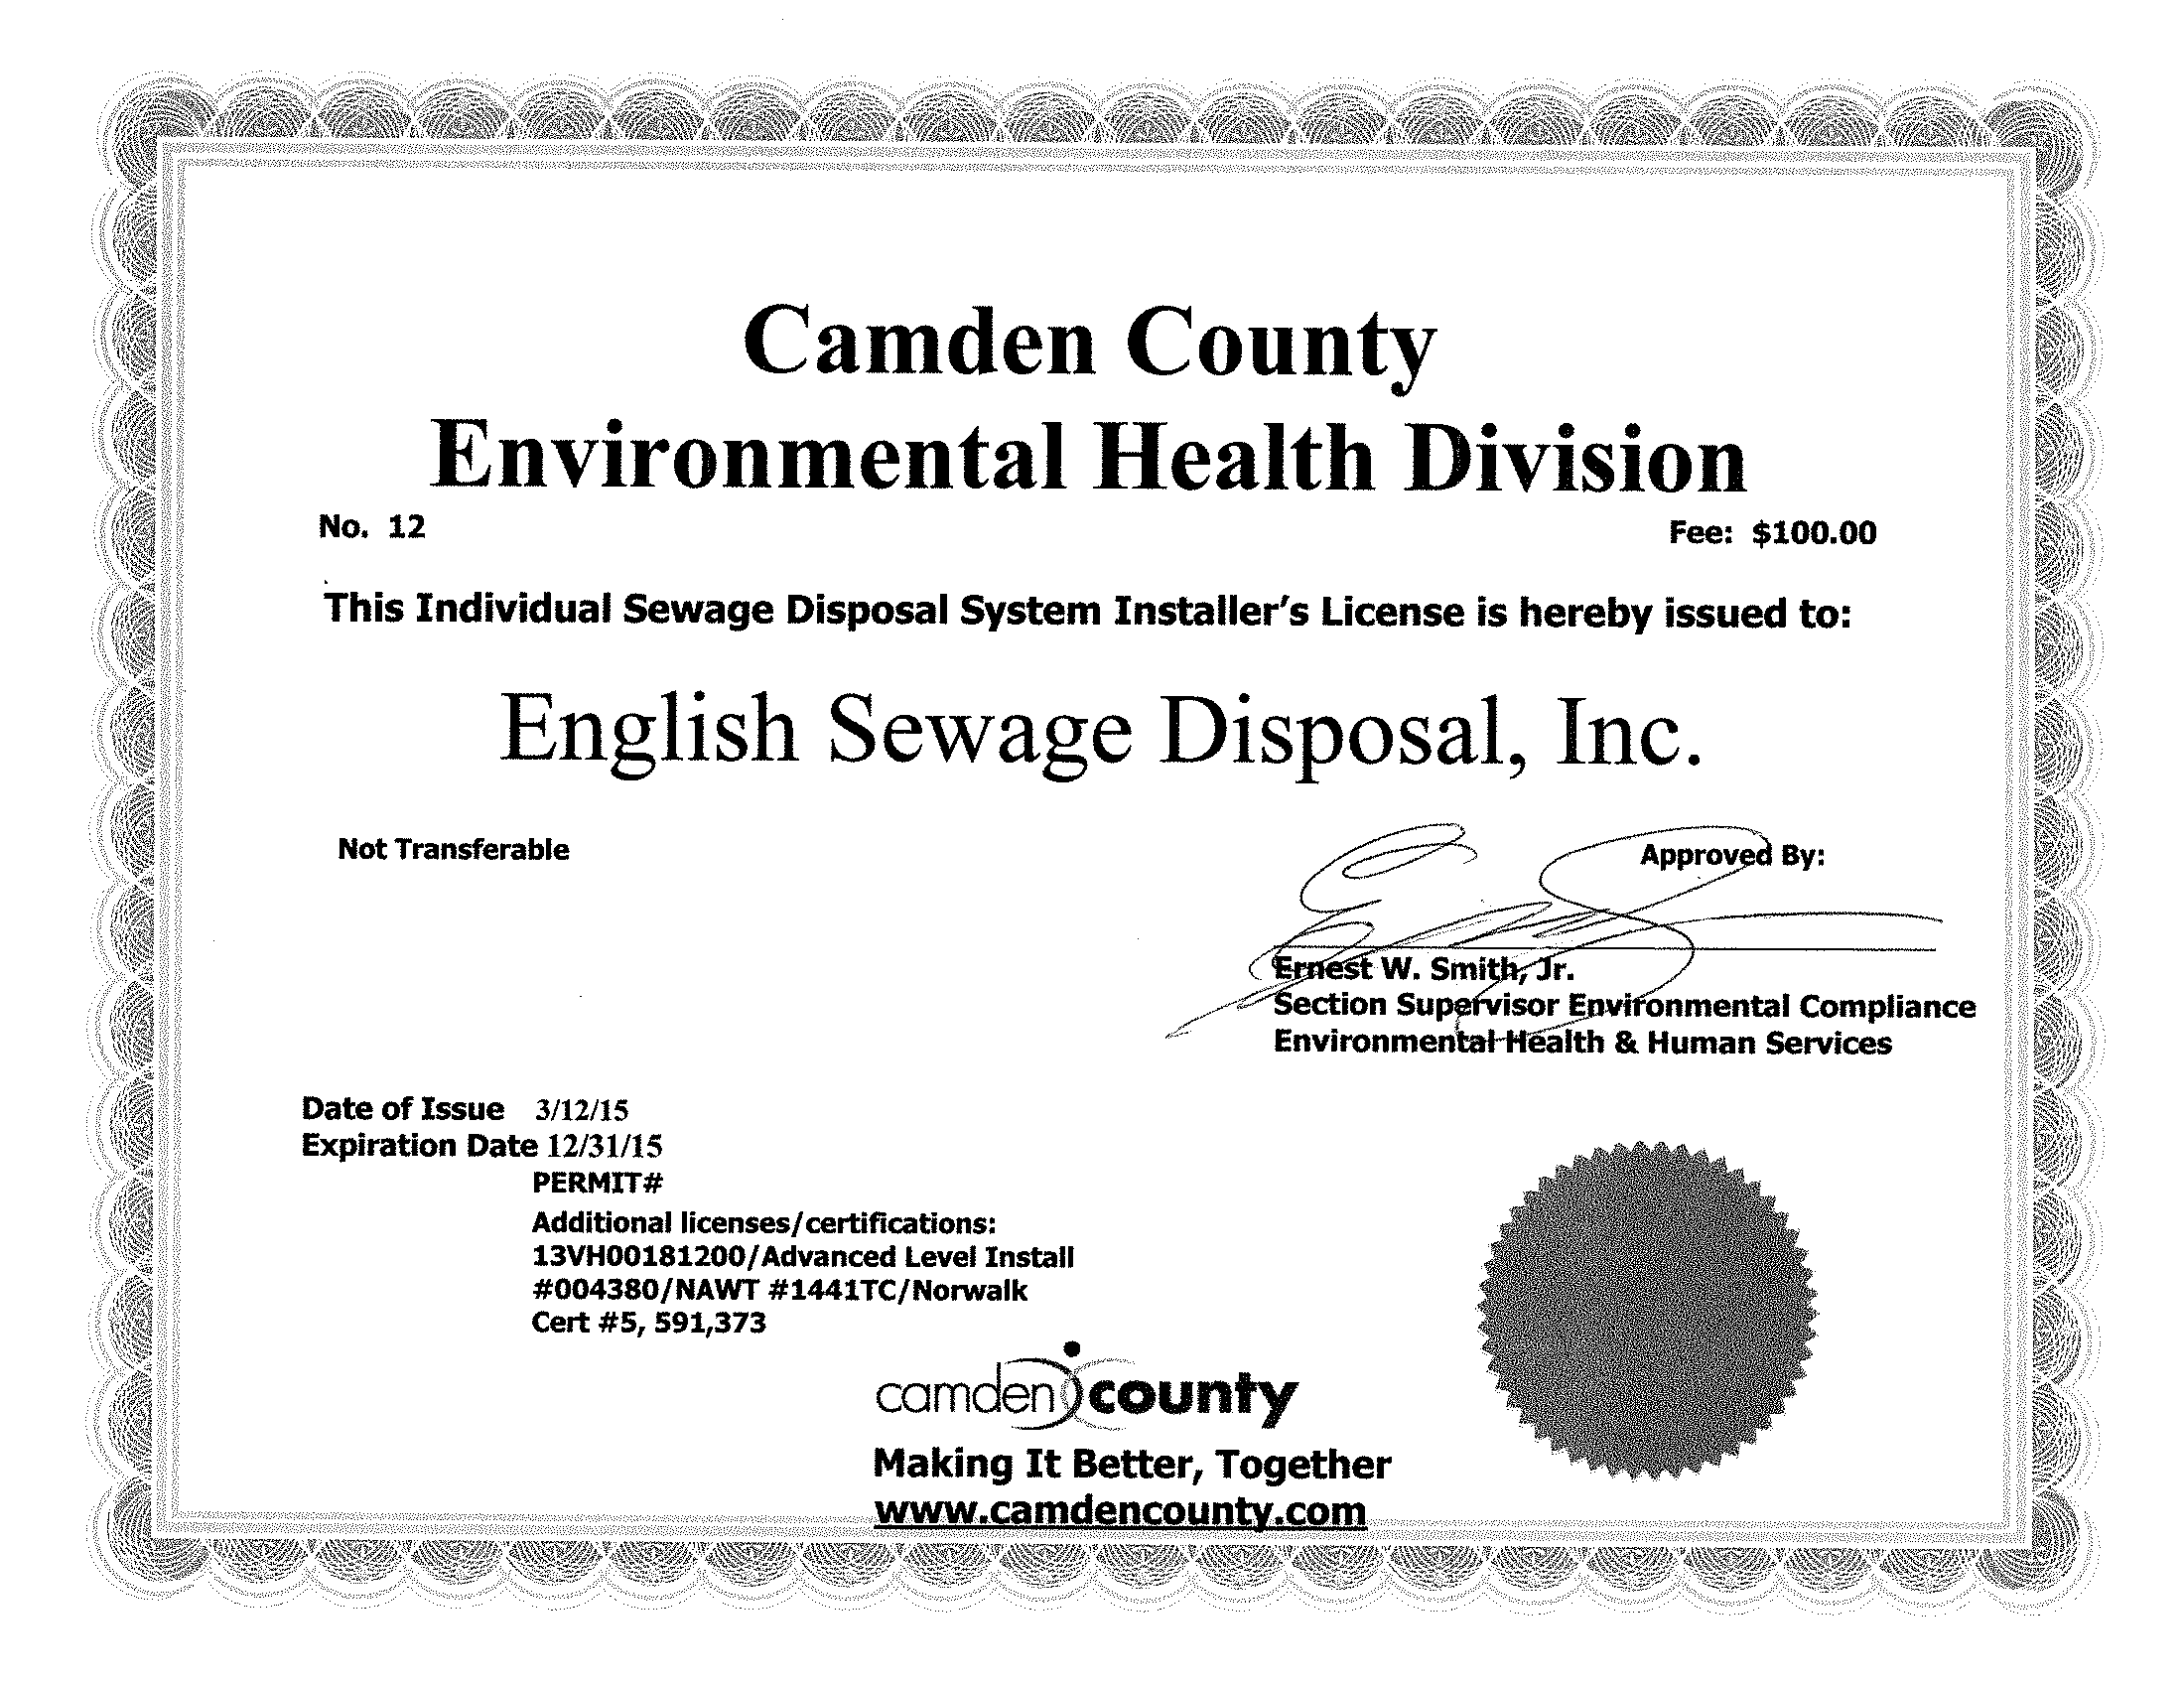 CamdenCoHD ISDSI License 2015